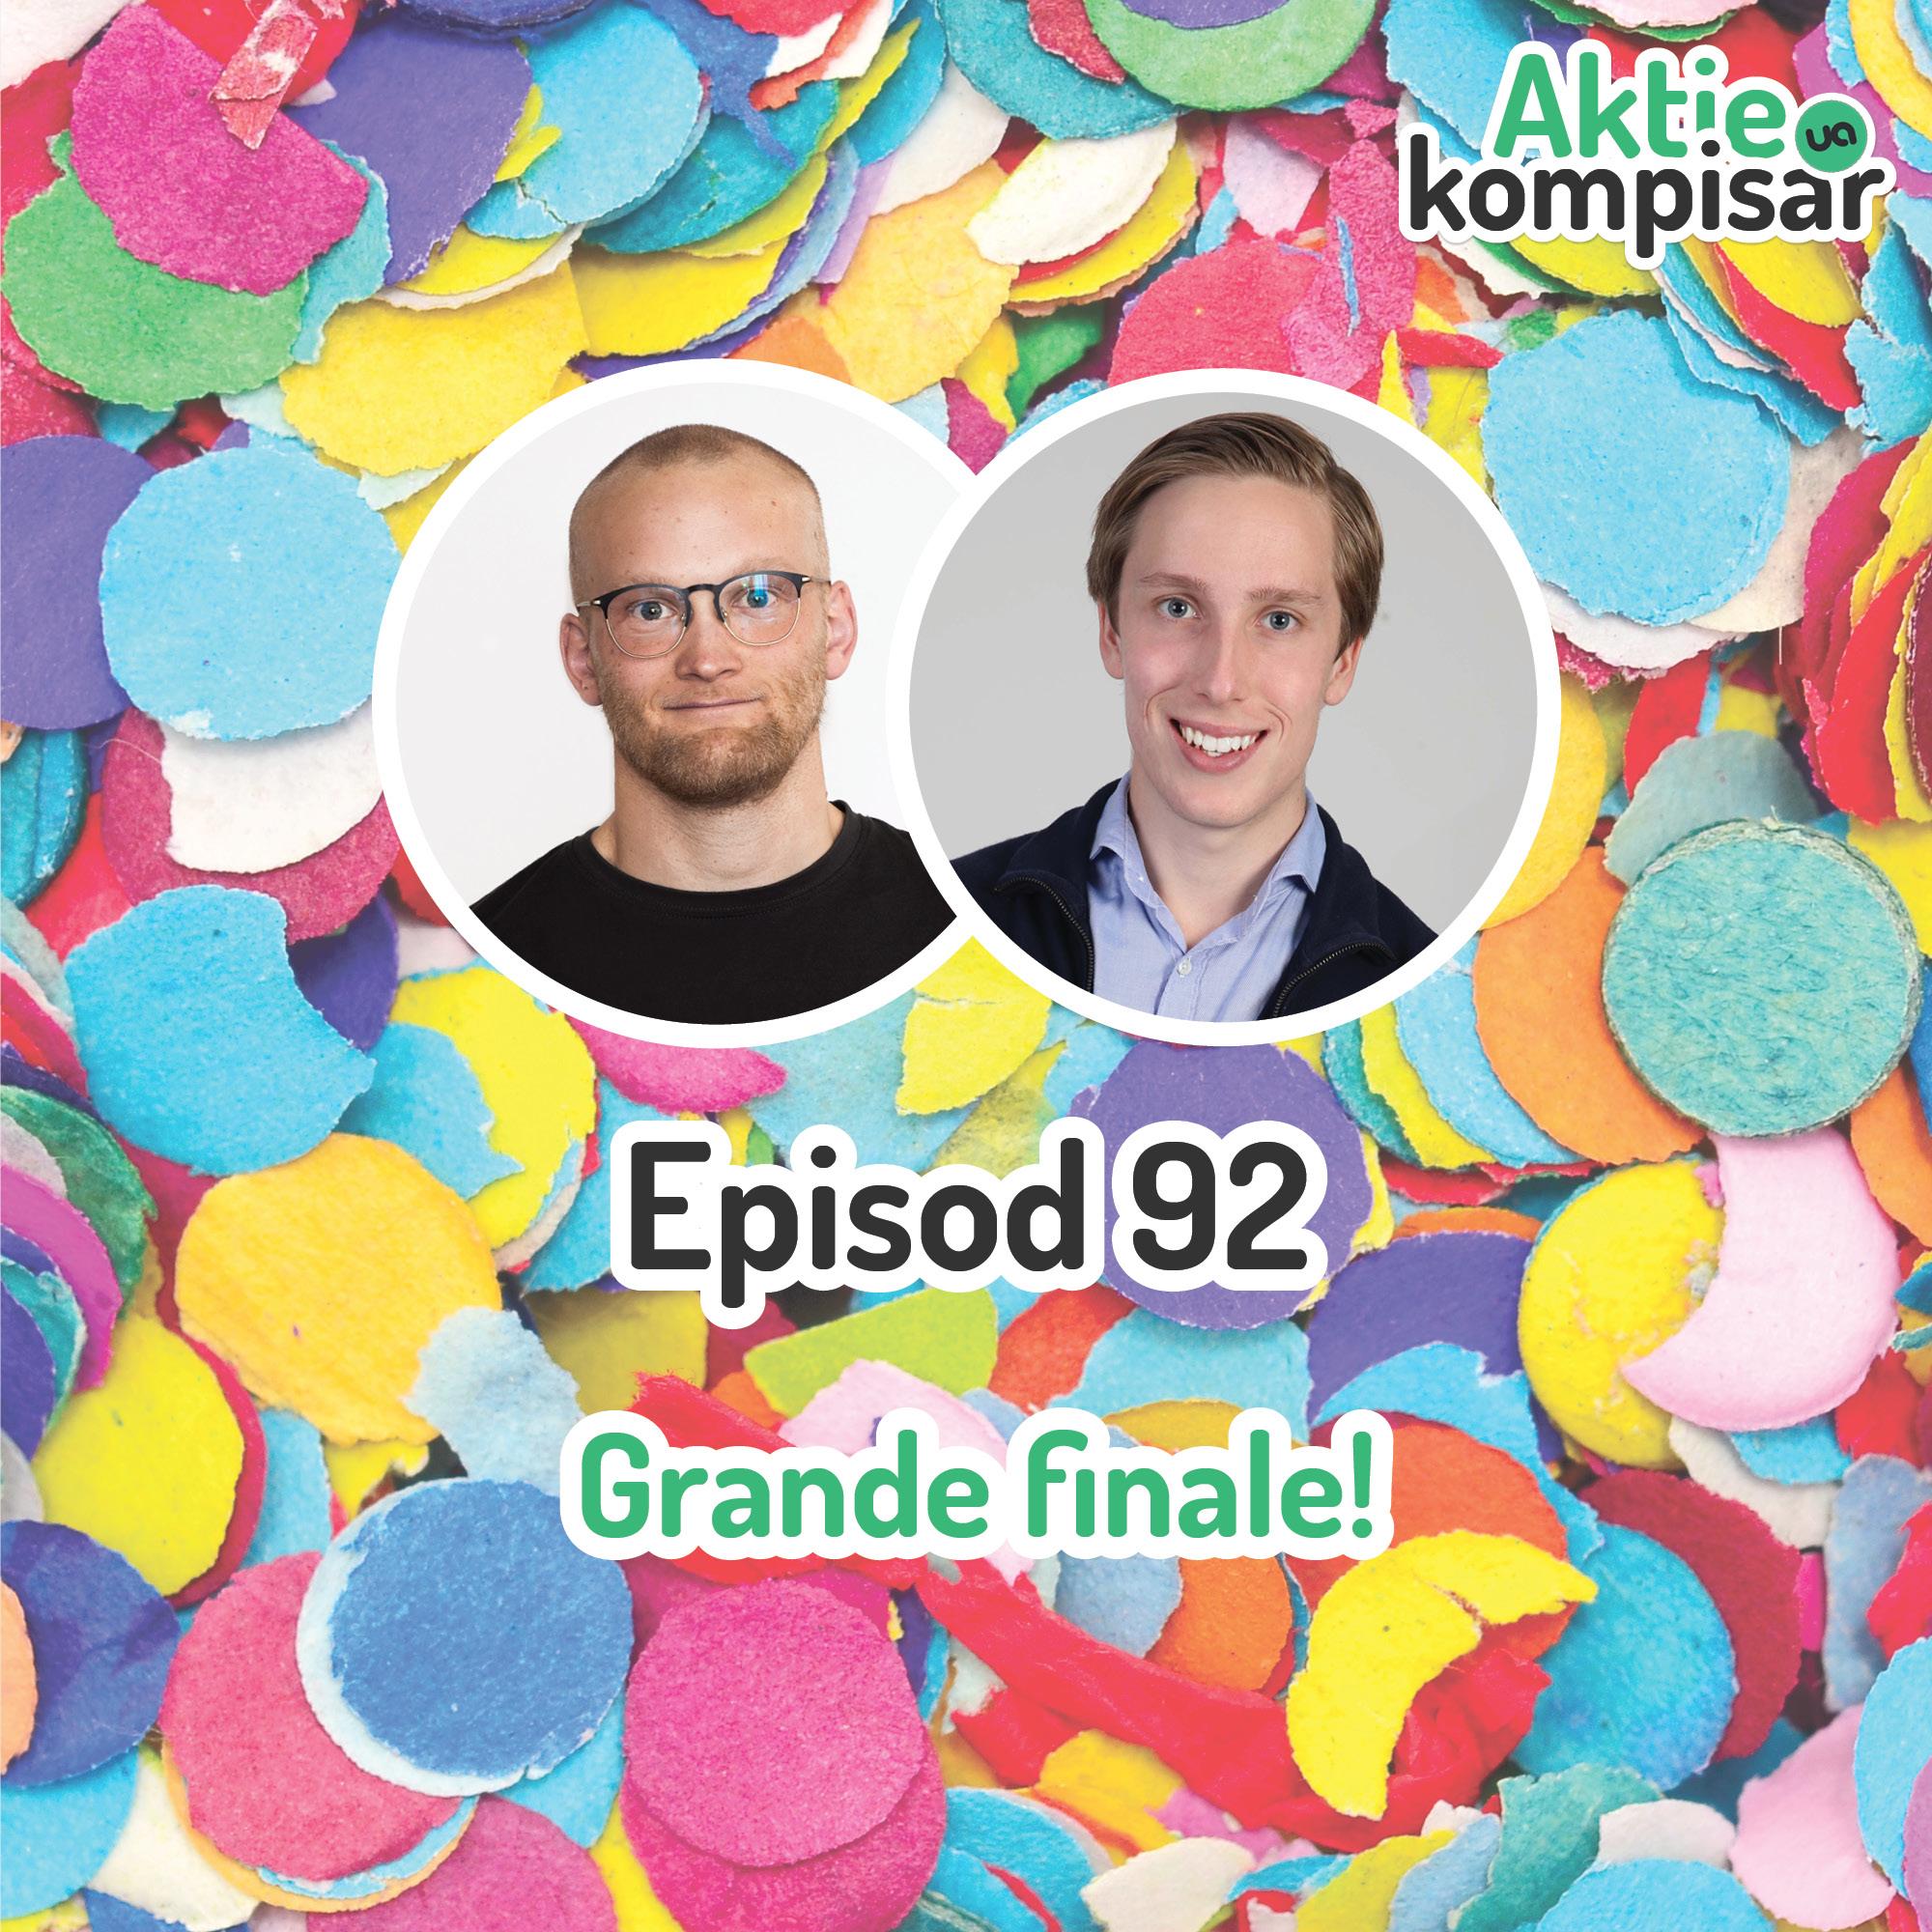 Episod 92 - Grande finale!